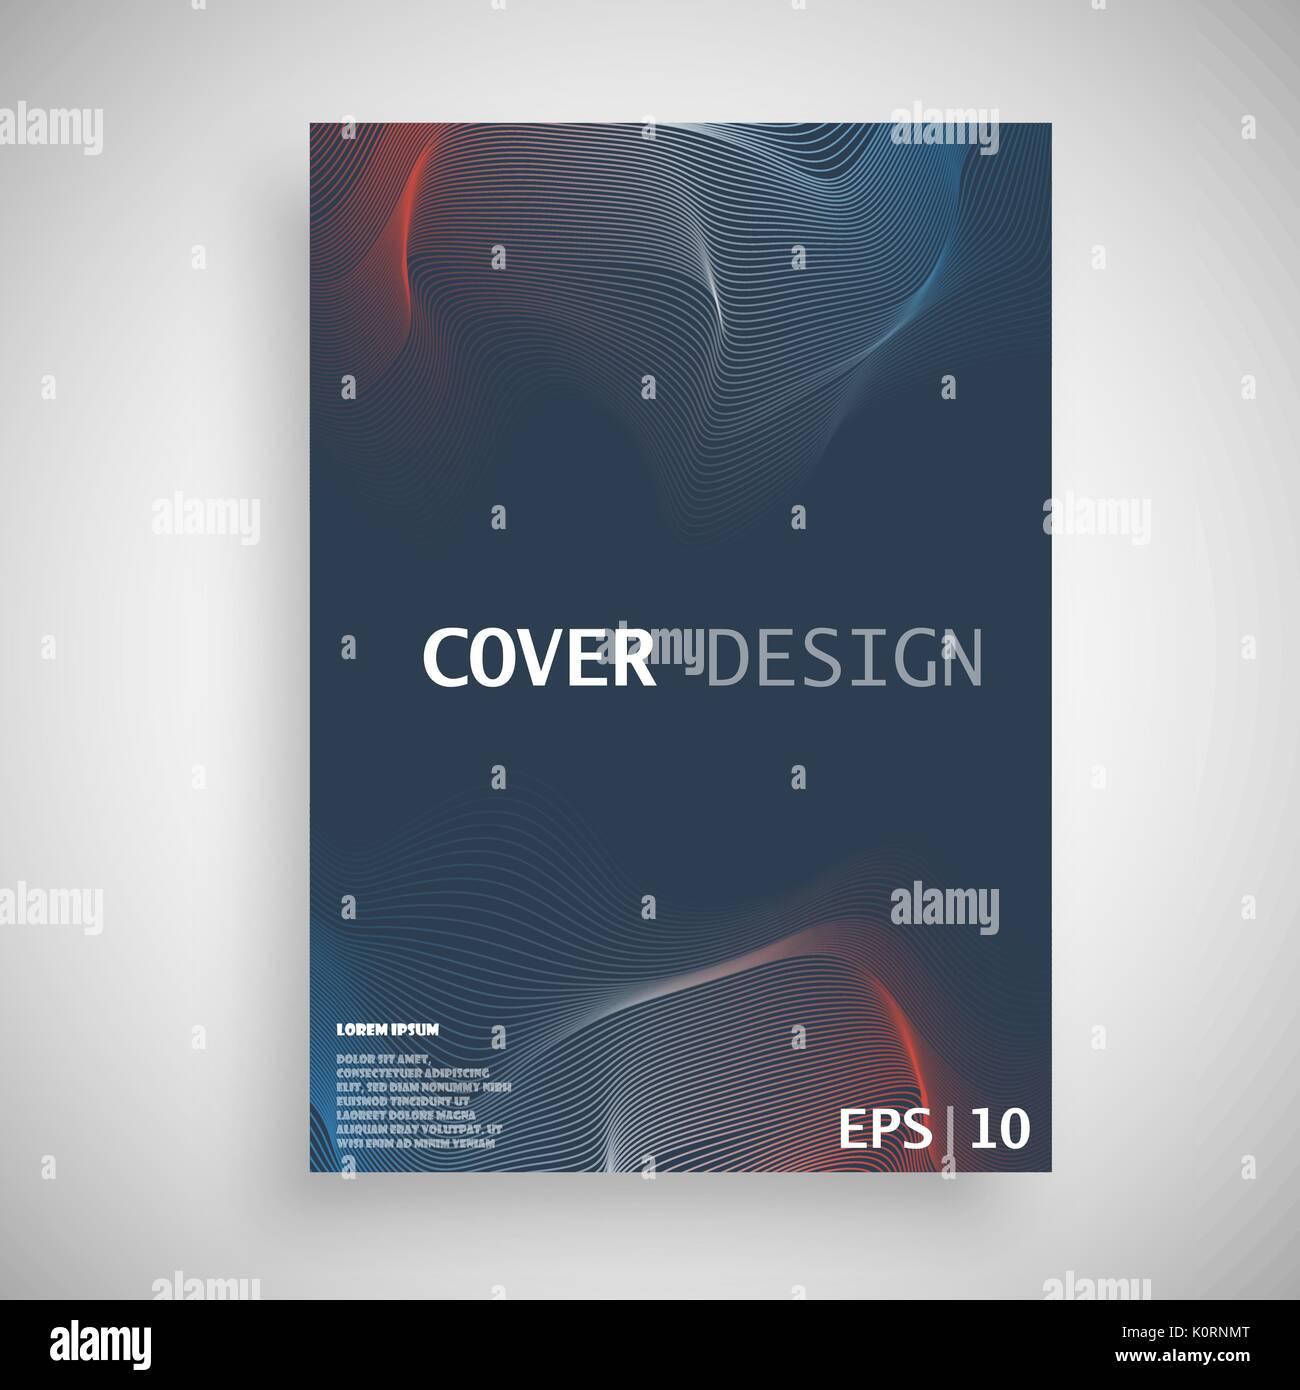 minimal vector covers design future poster template stock vector